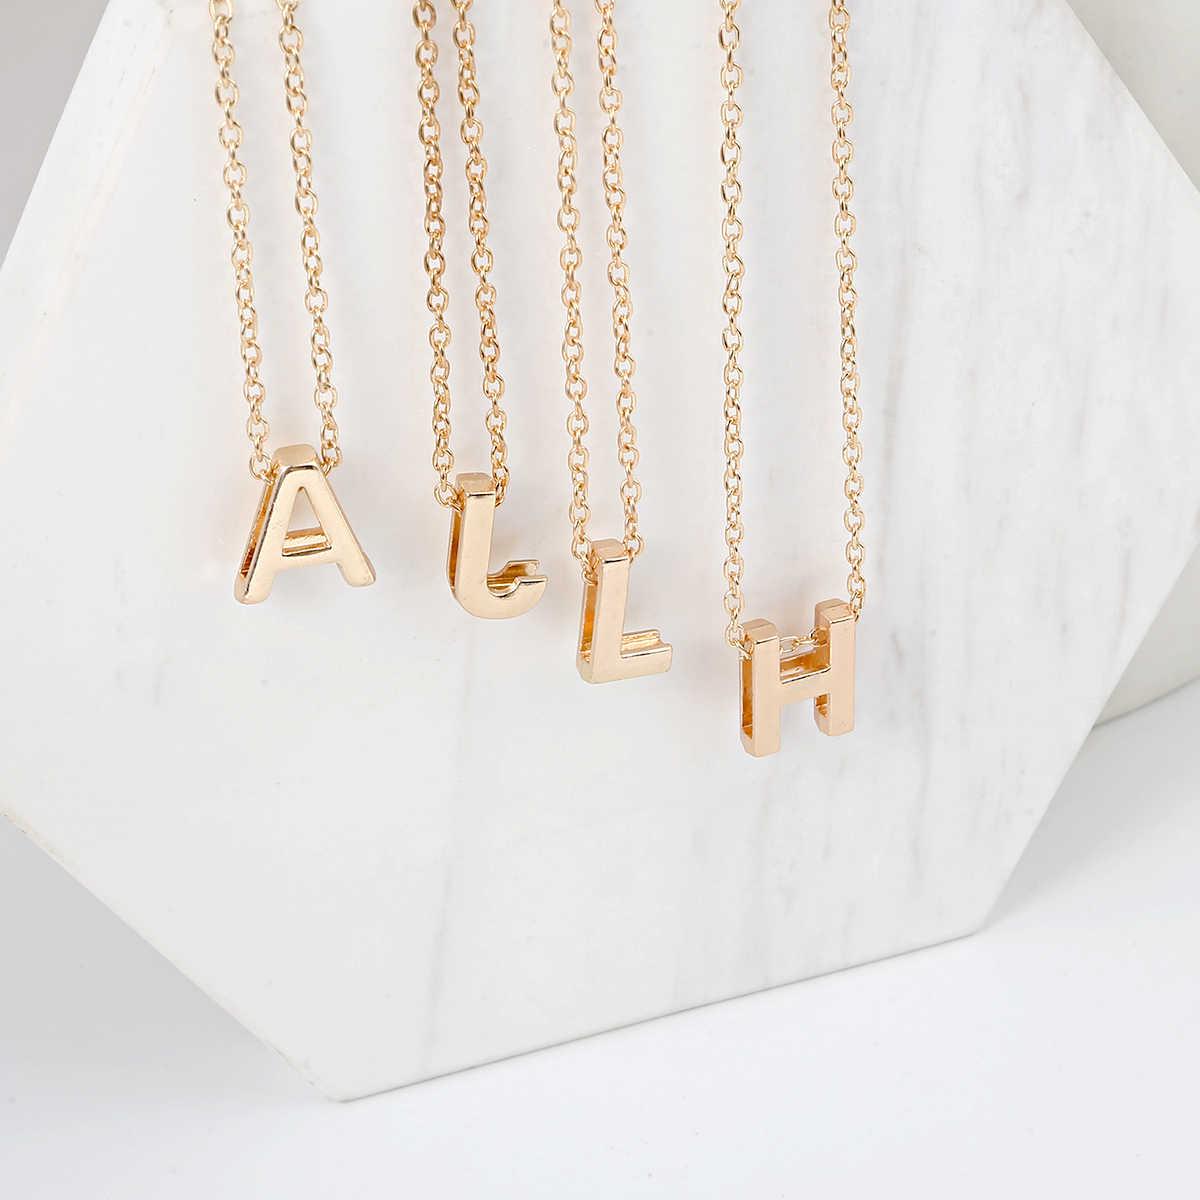 Encantos Iniciais de Ouro da moda Colar de Pingente de Letras De Metal Para A Jóia Personalizada Bonito Letras Único Colares Corrente de Ouro